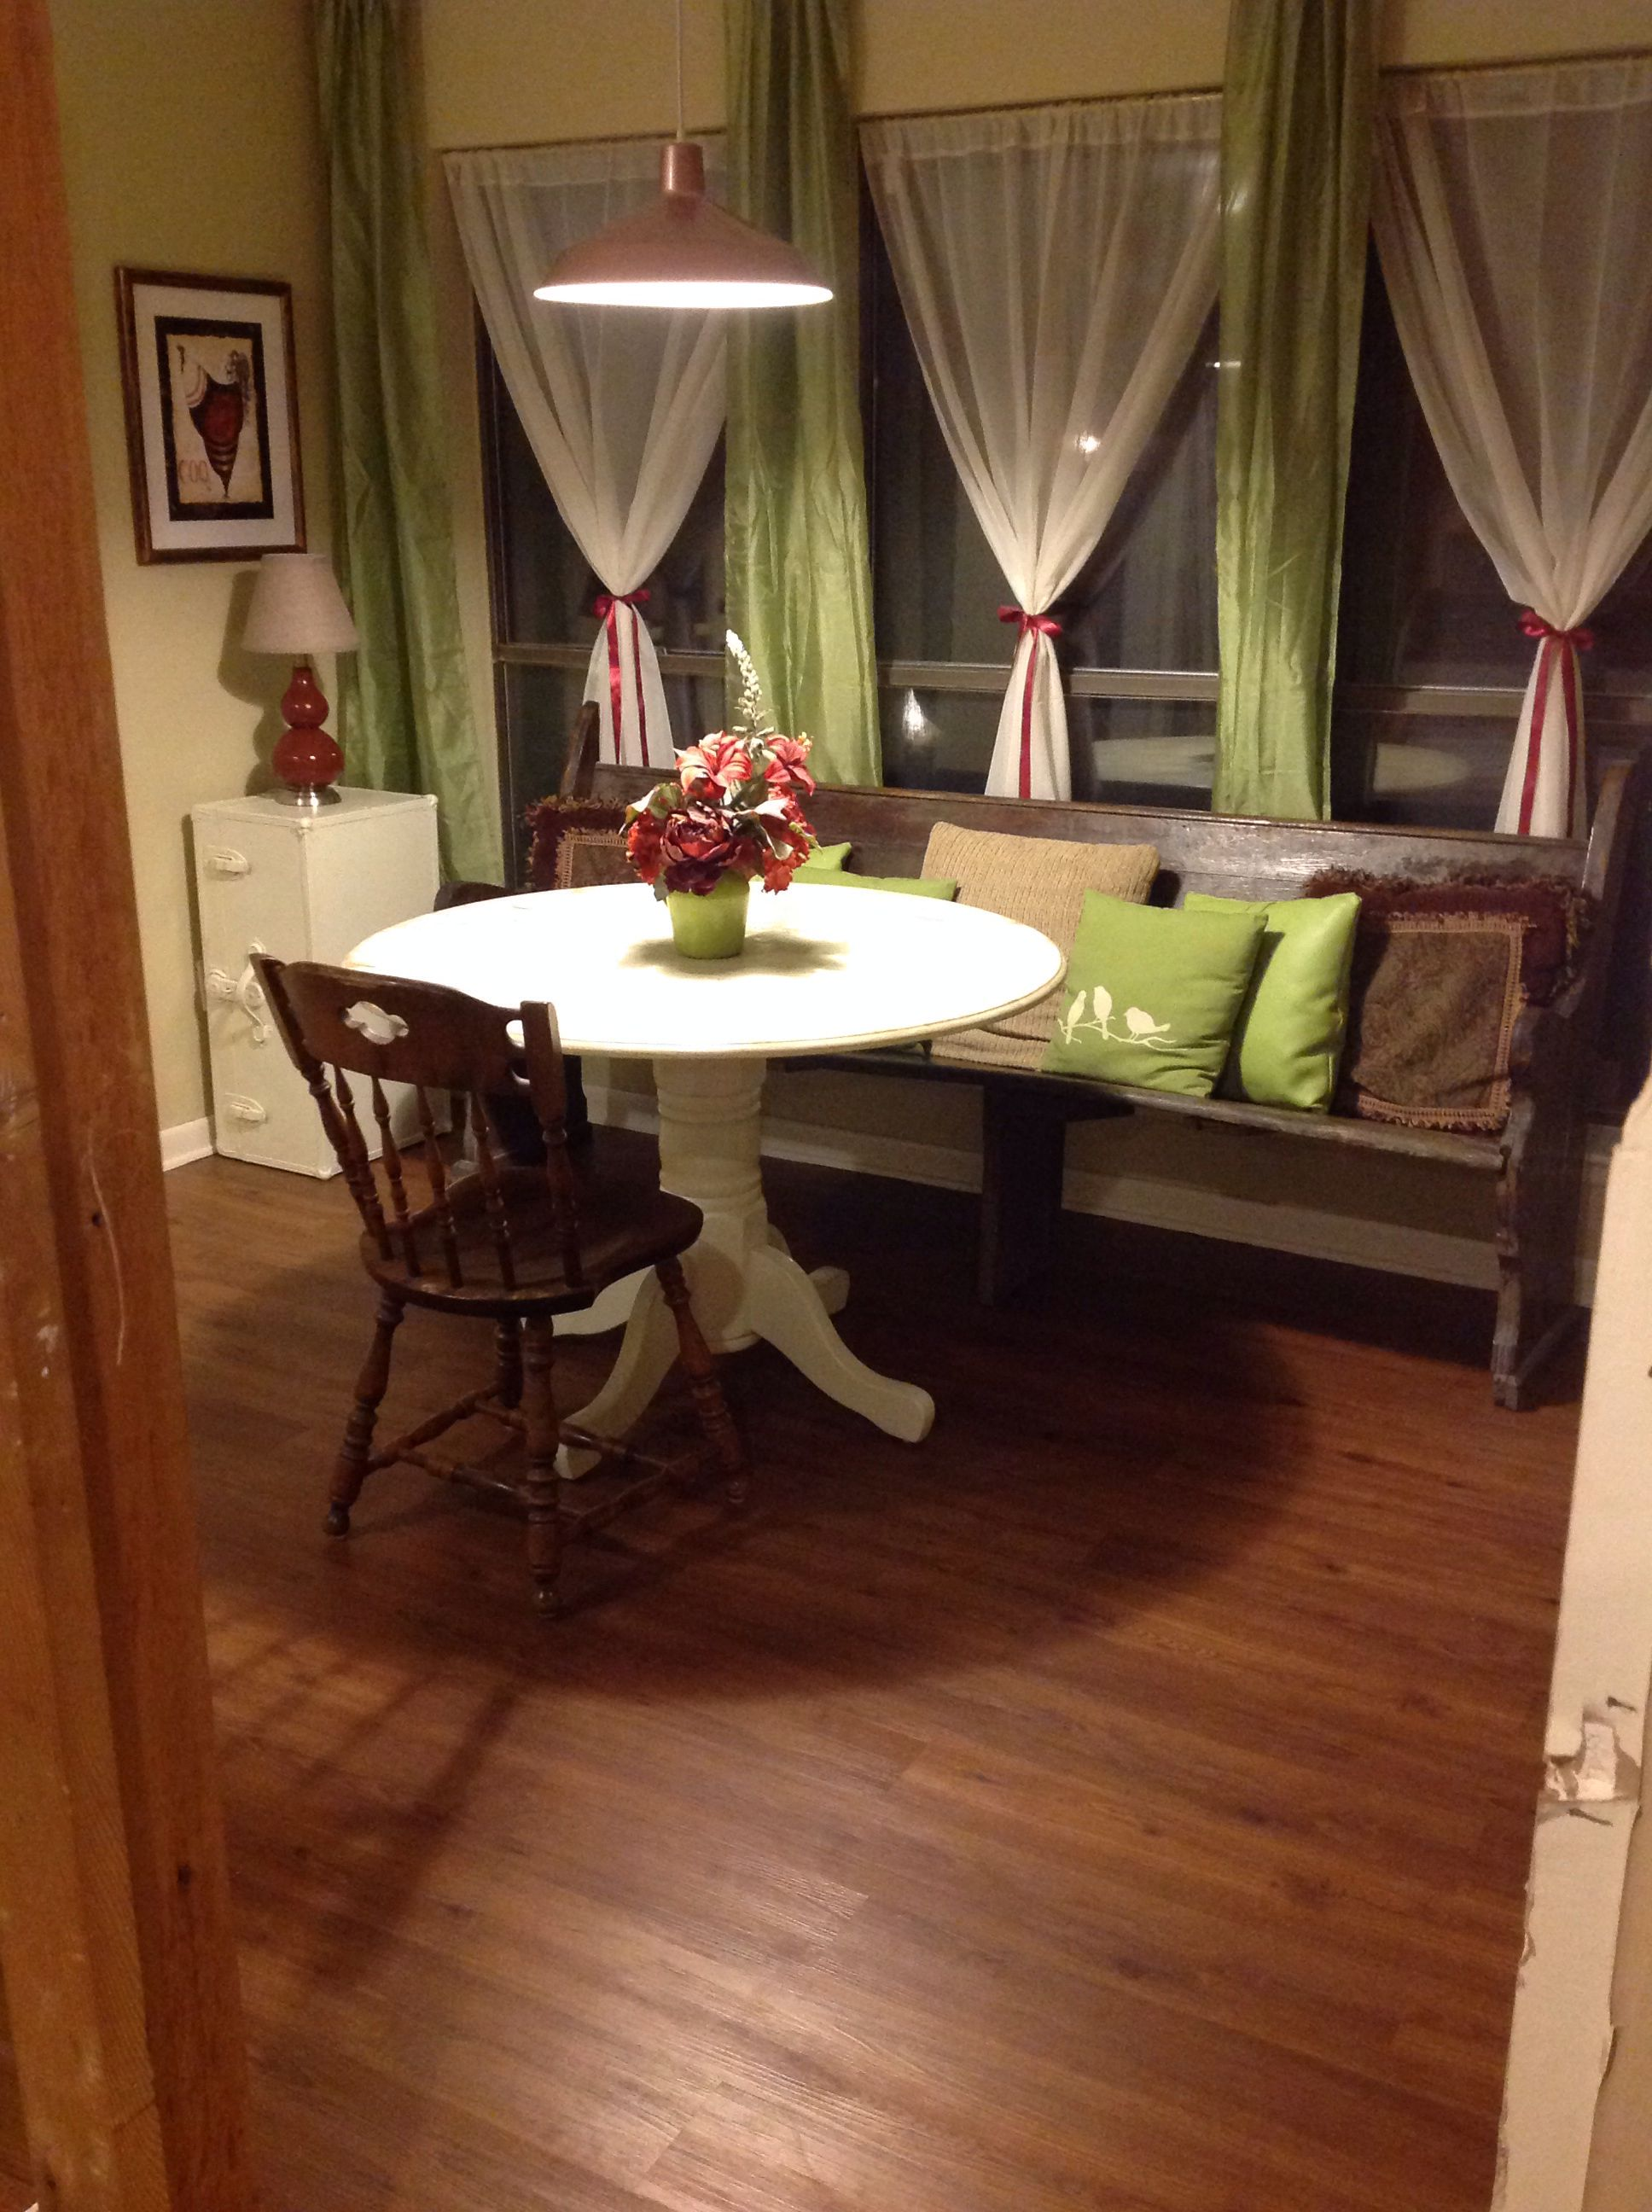 Dinning room decorated on garage sale, resale, outlet